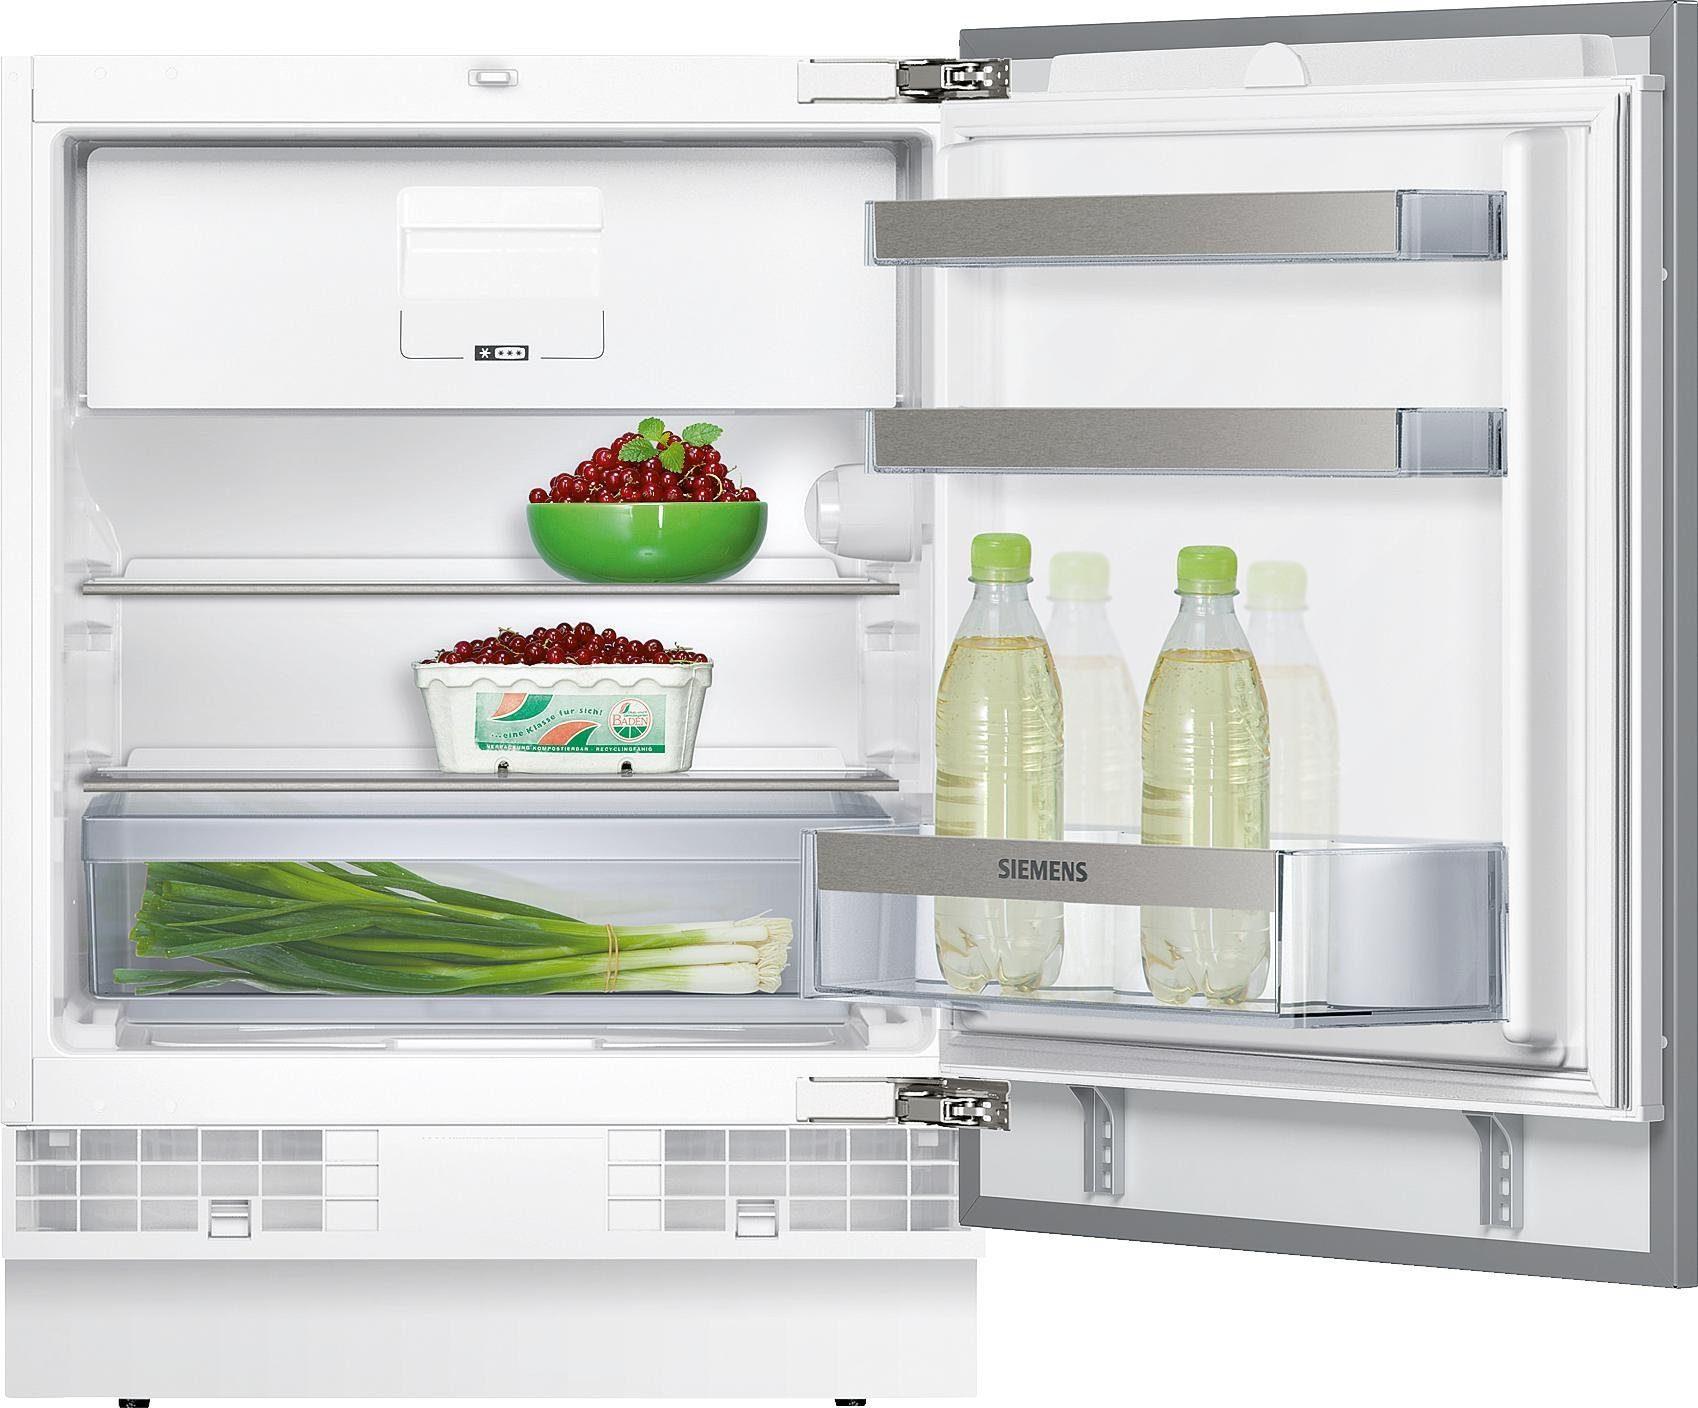 SIEMENS Einbaukühlschrank KU15LSX60, 82,0 cm hoch, 59,8 cm breit, A++, 82 cm hoch, integrierbar